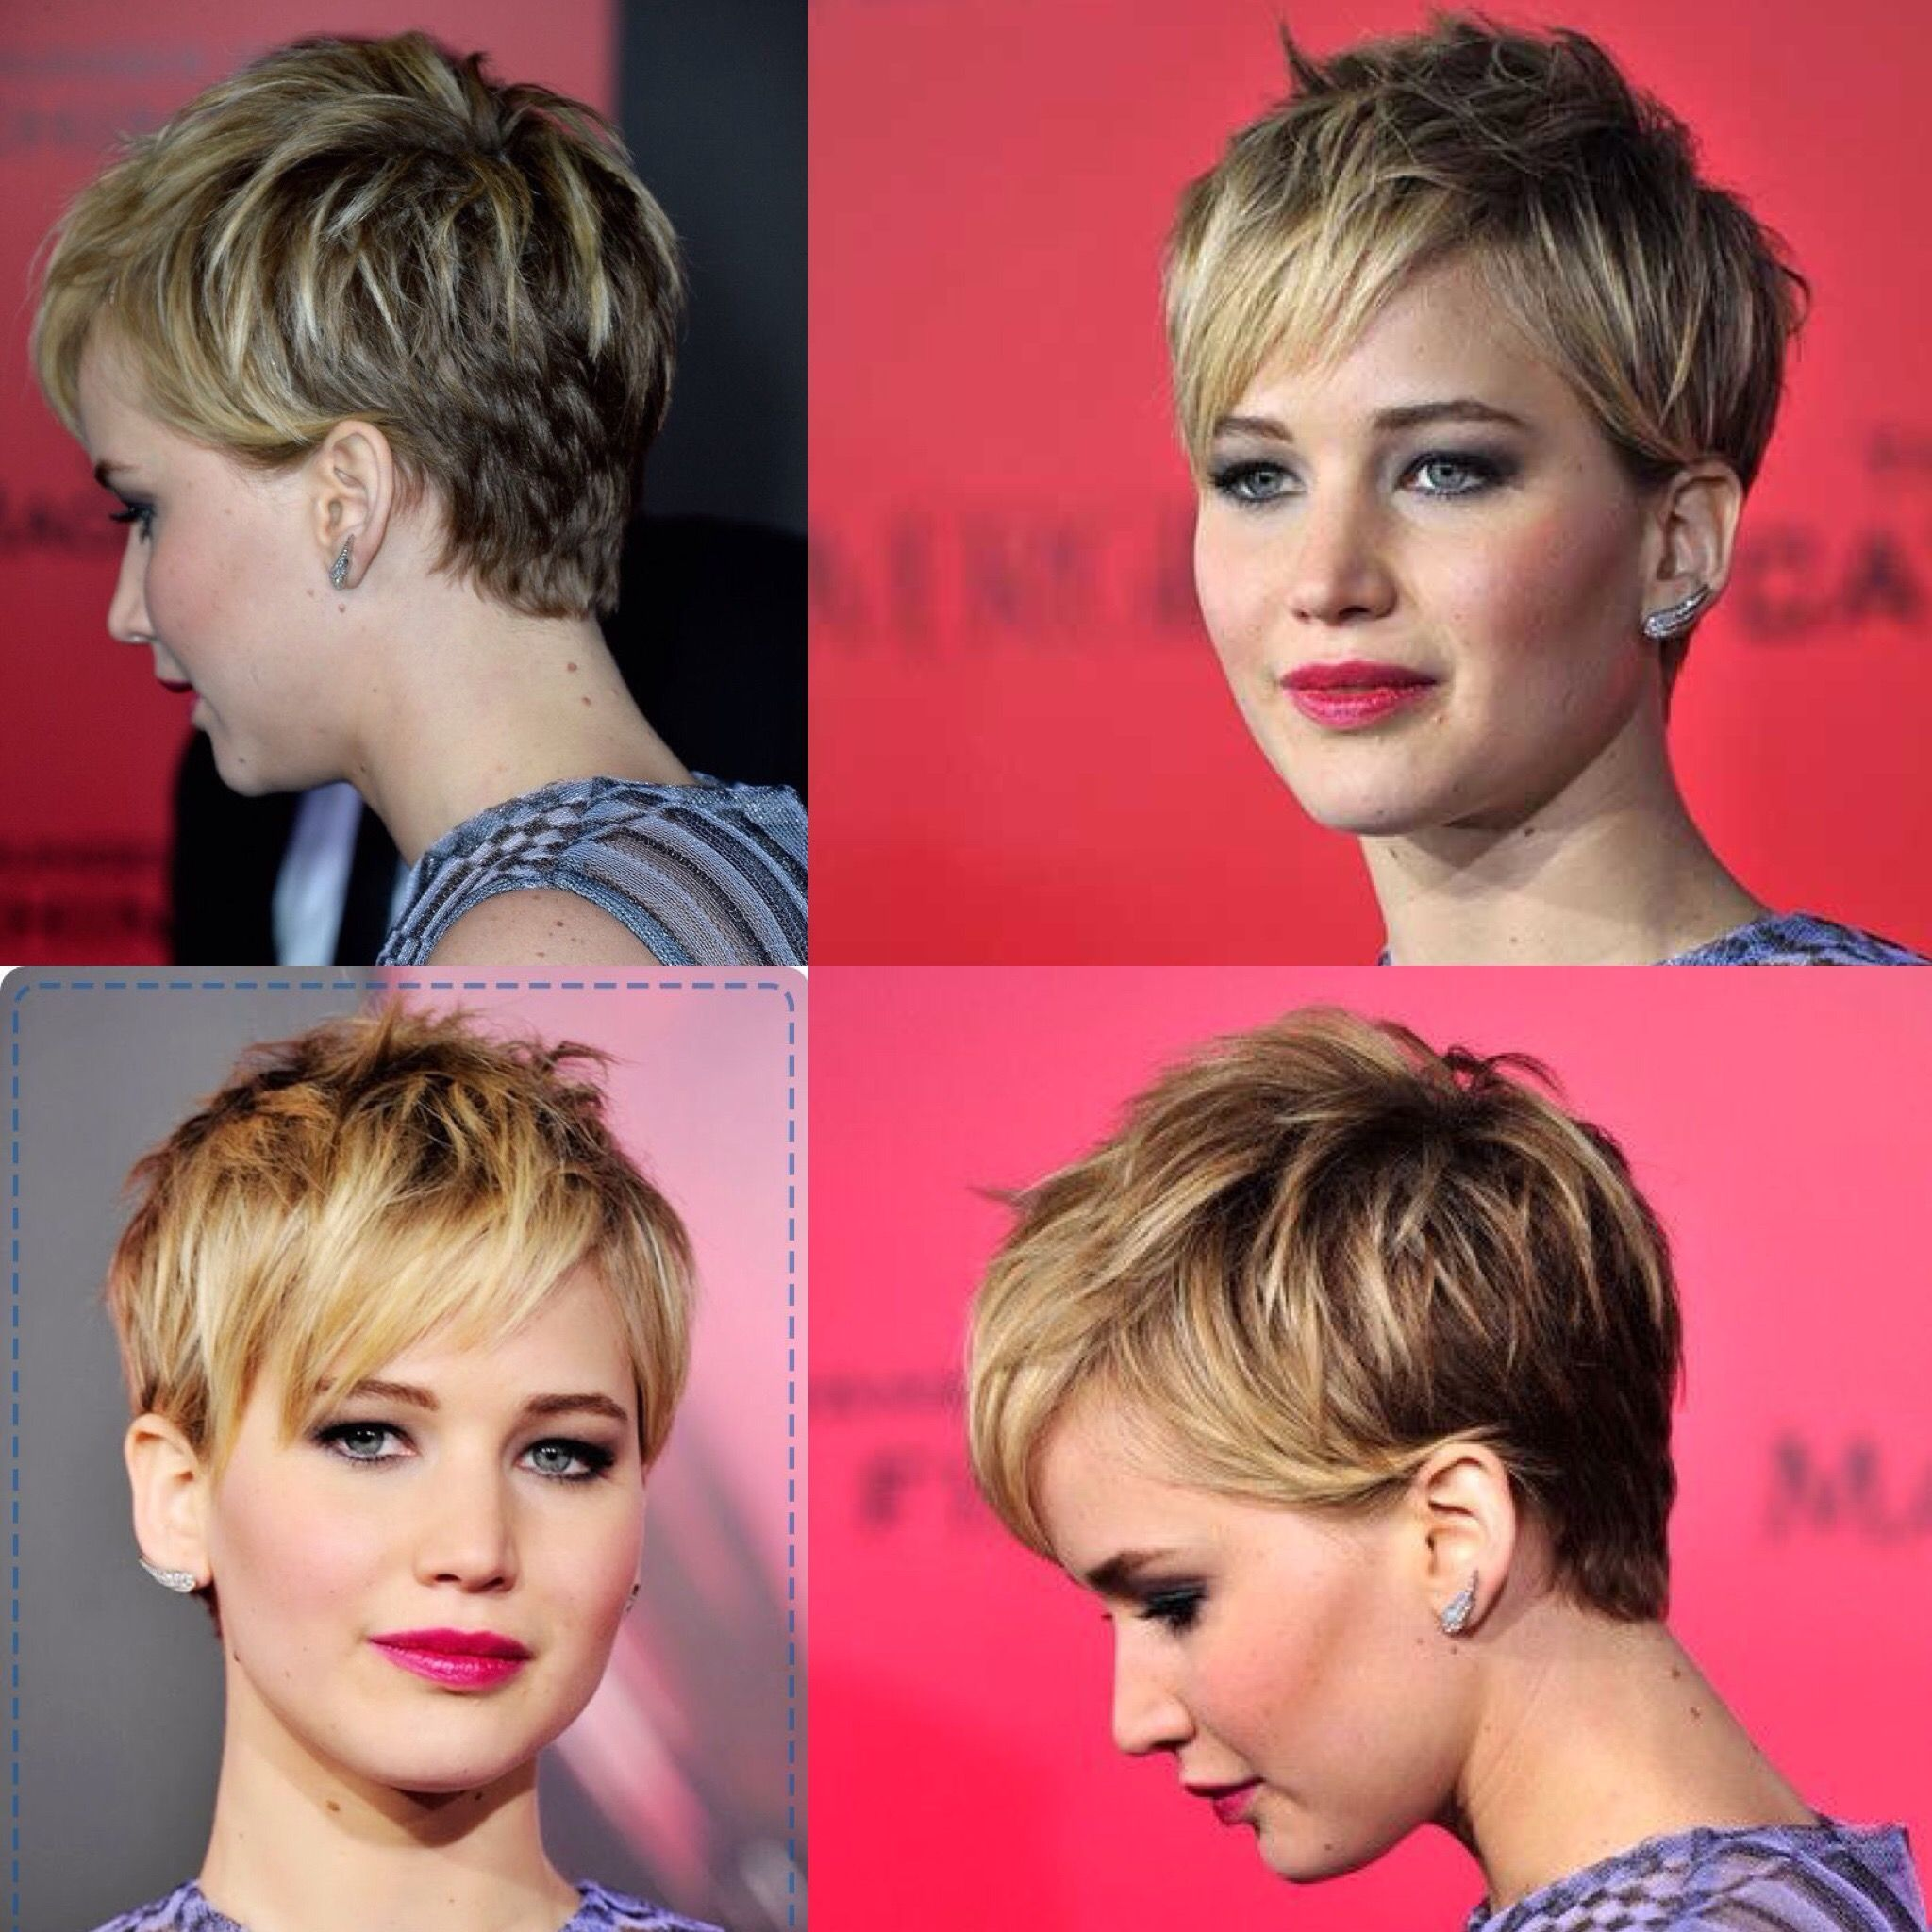 Jennifer Lawrence Pixie Cut Hair In 2018 Pinterest Hair Short